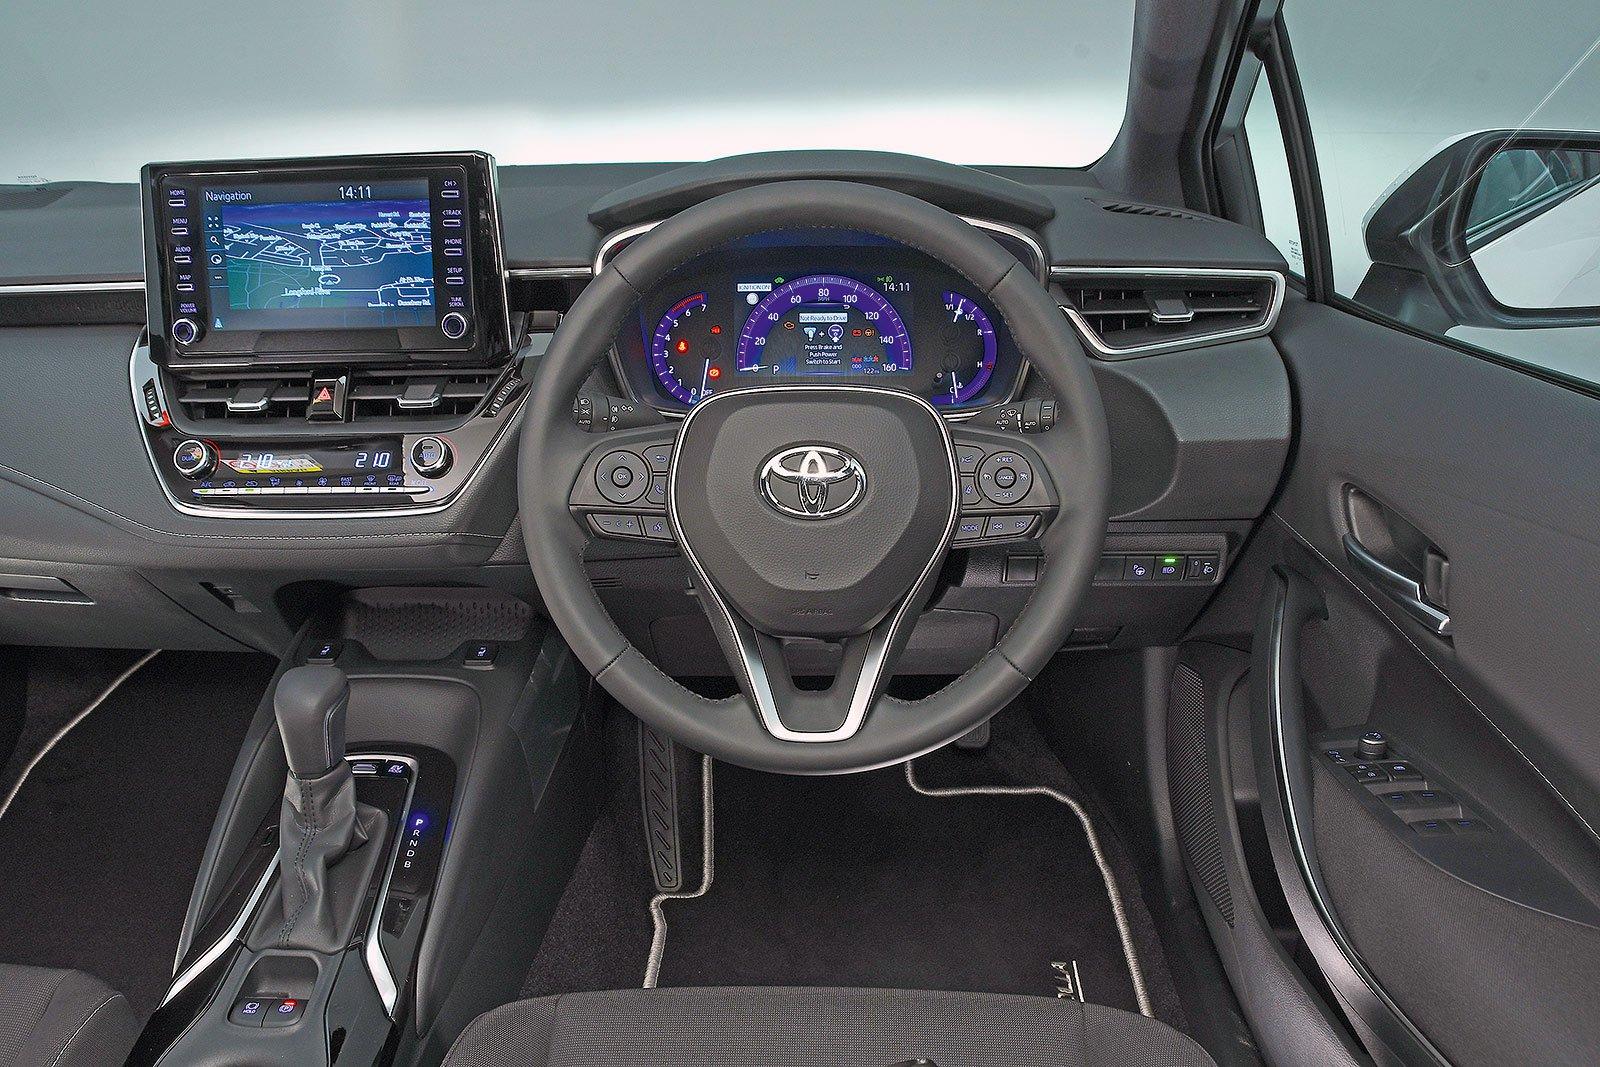 Toyota Corolla Hybrid Design 1.8 VVT-i - interior